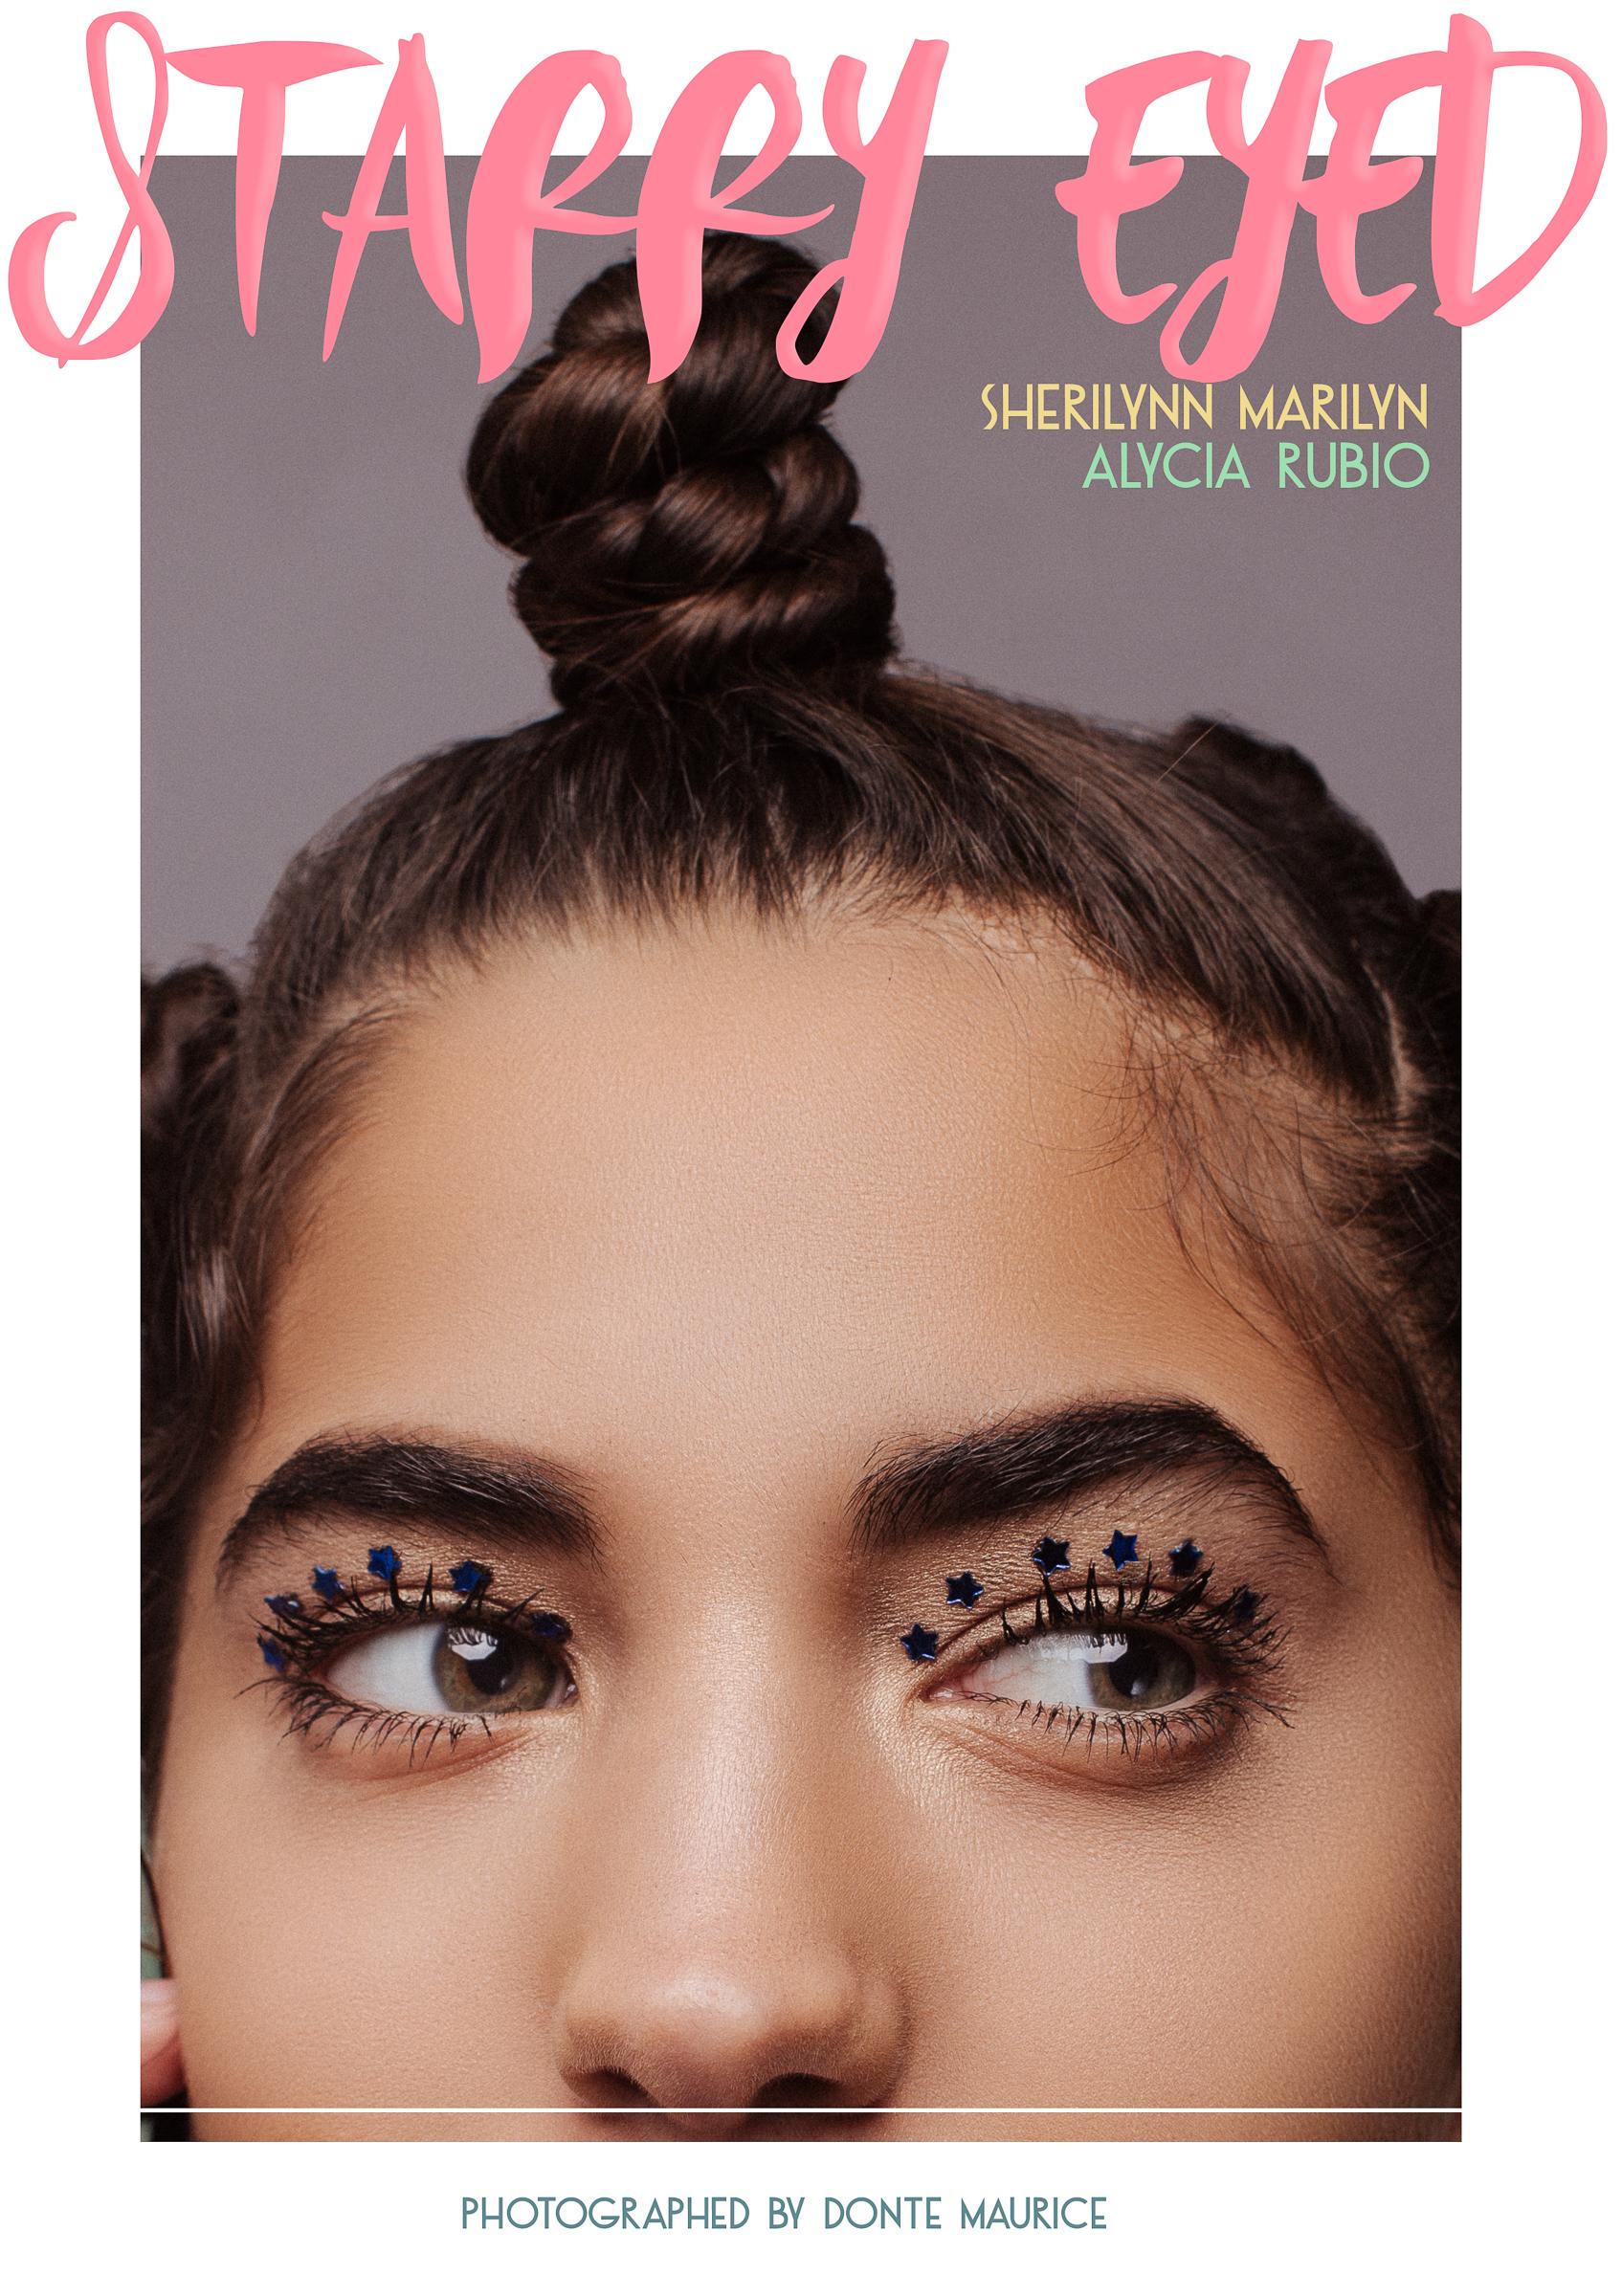 Starry-Eyed-Alycia-Rubio-hires-web-1 (1).jpg